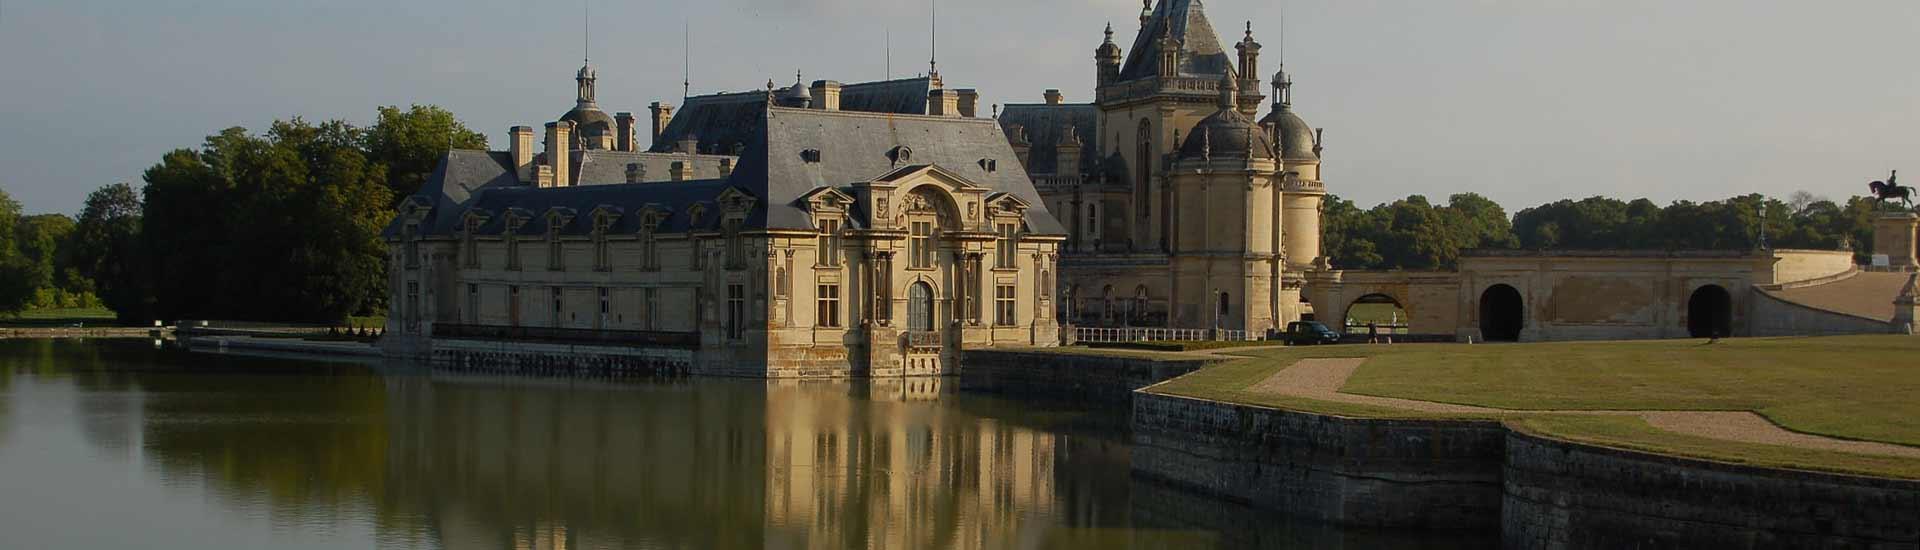 Séjourner au Château de Nazé à Saumur